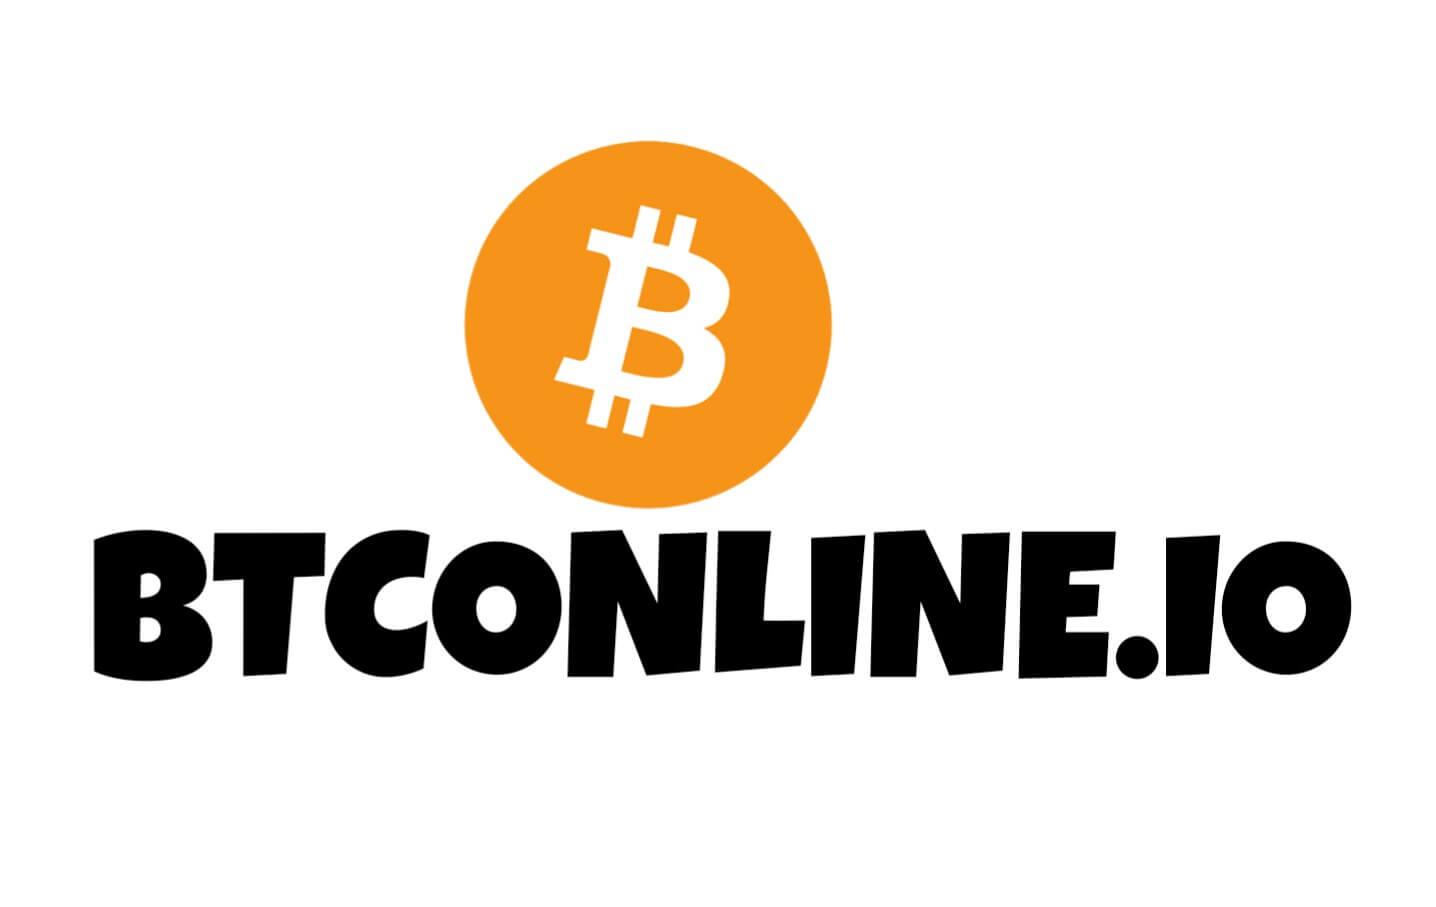 Diartikel ketujuh puluh sembilan ini, Saya akan memberikan Tutorial Cara bermain di situs BTC Online hingga mendapatkan Bitcoin sebanyak 30.000 Satoshi per hari atau 0,0003 BTC/day.